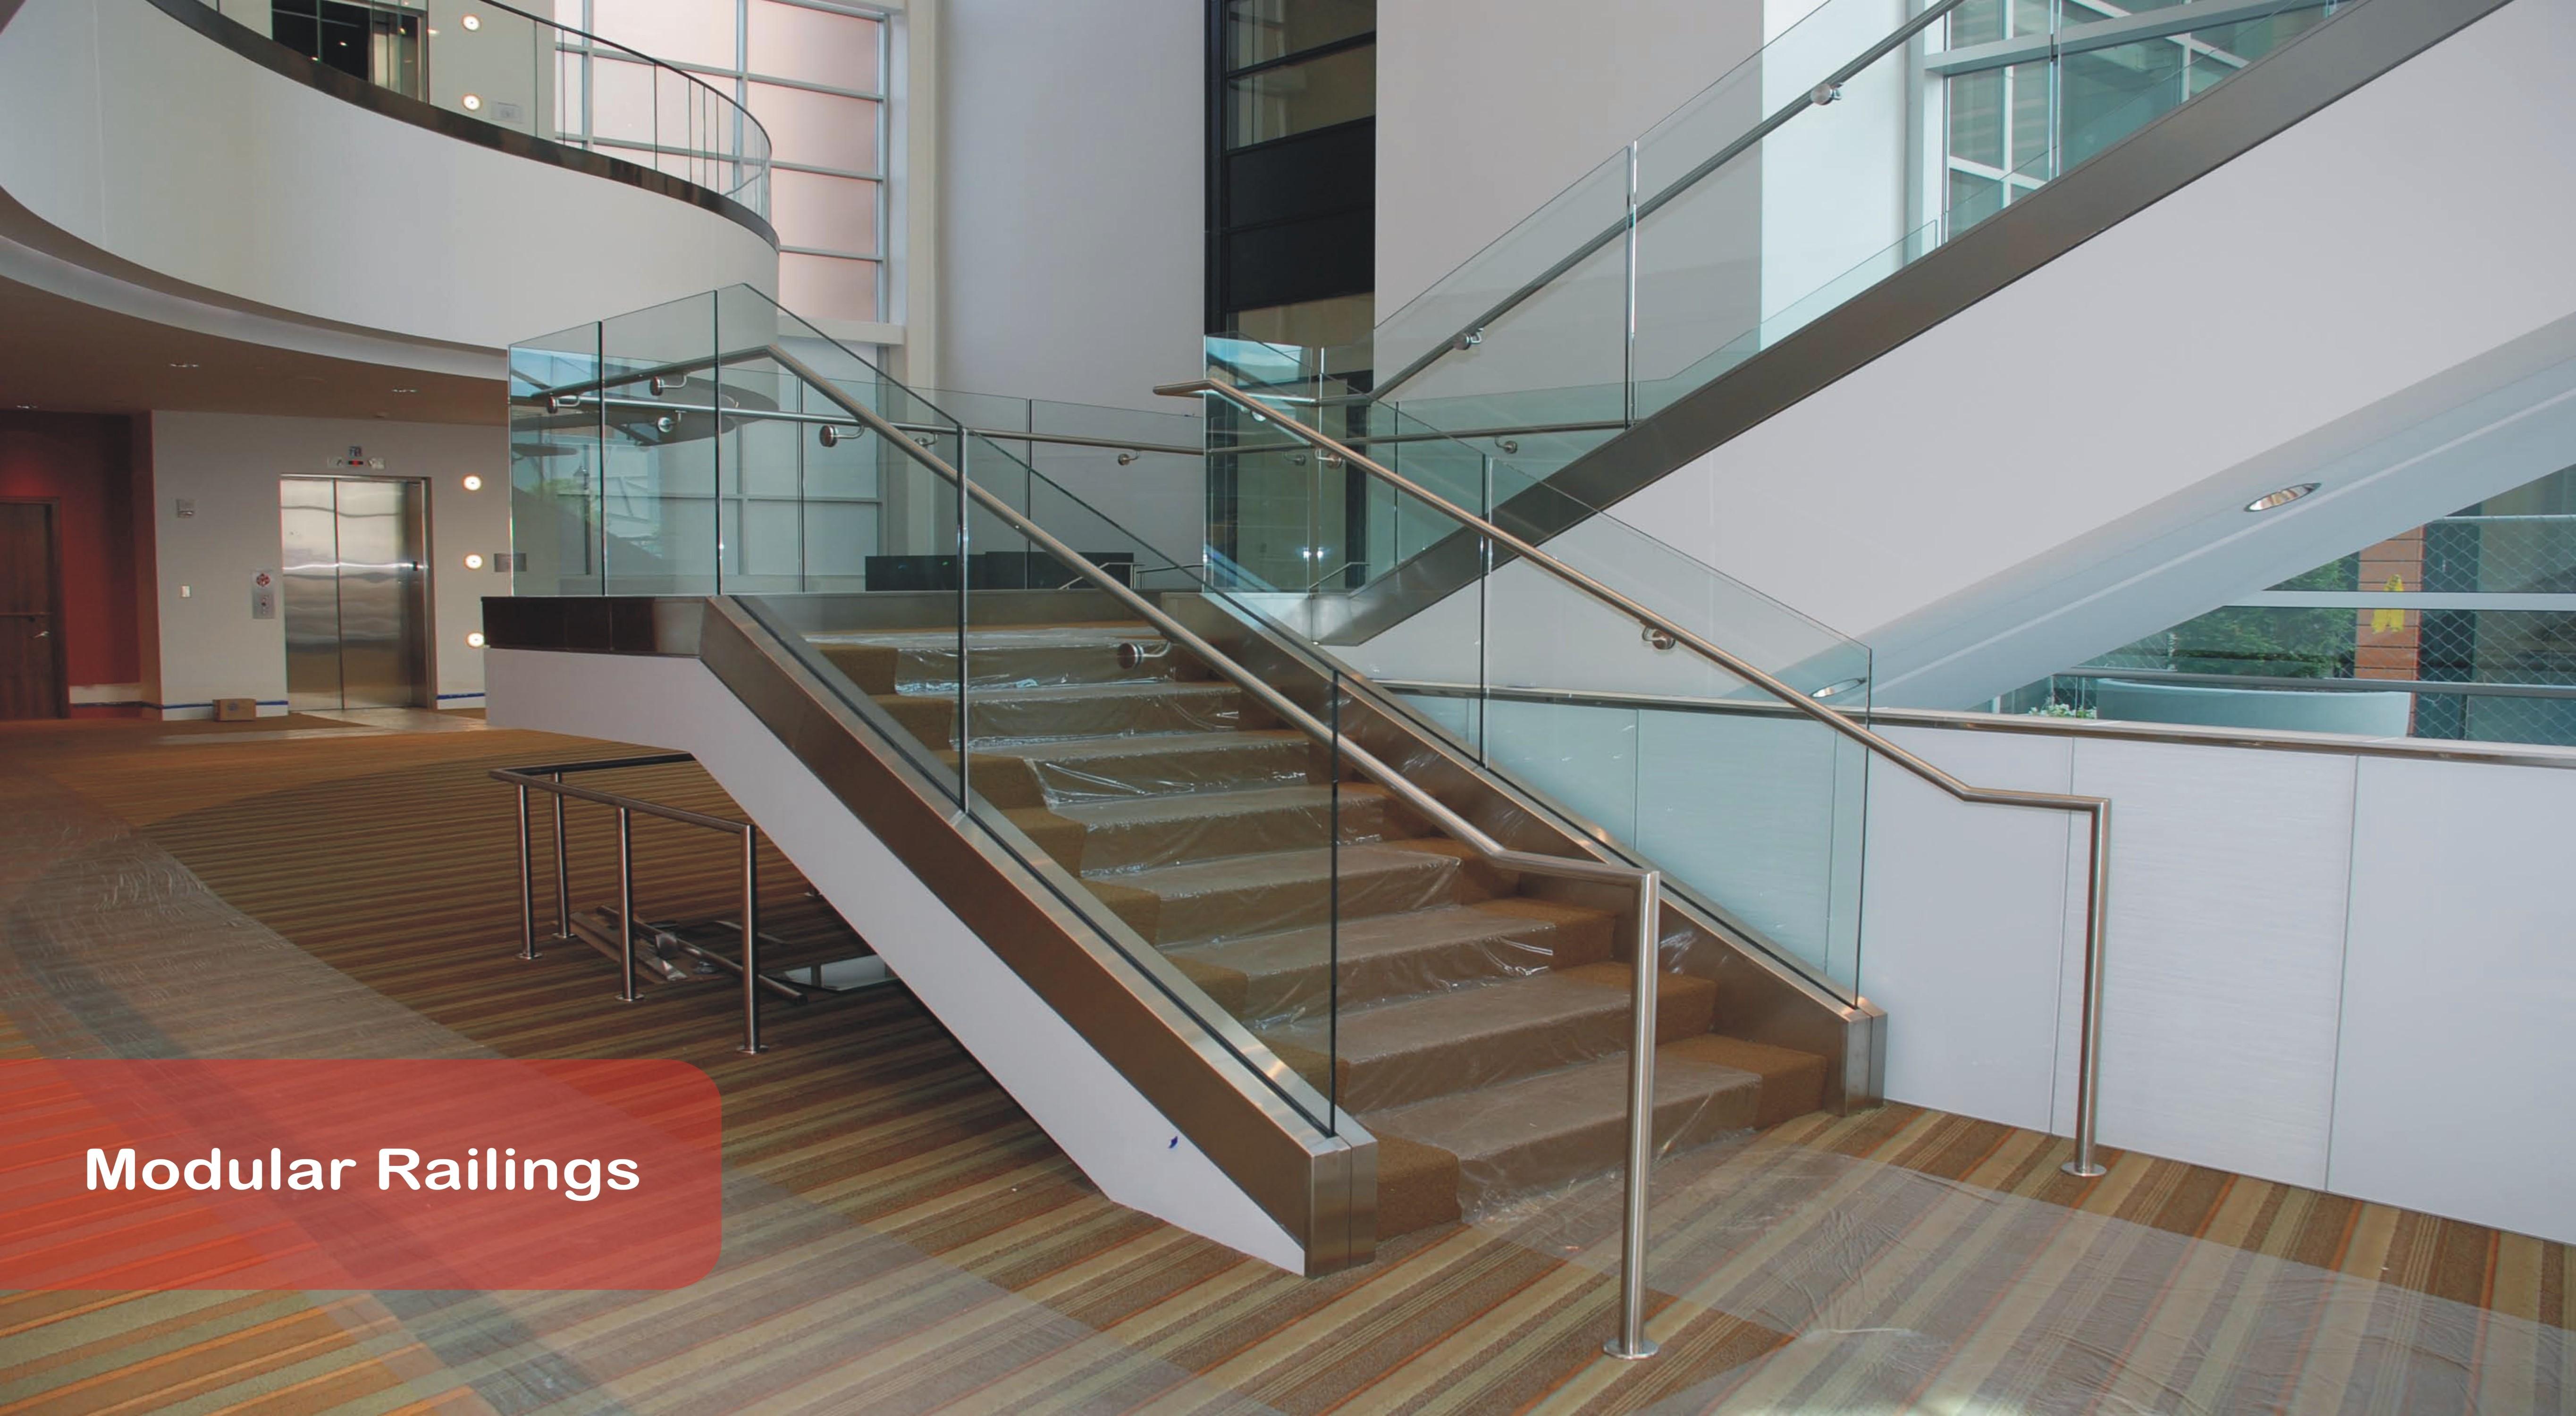 modular-railings